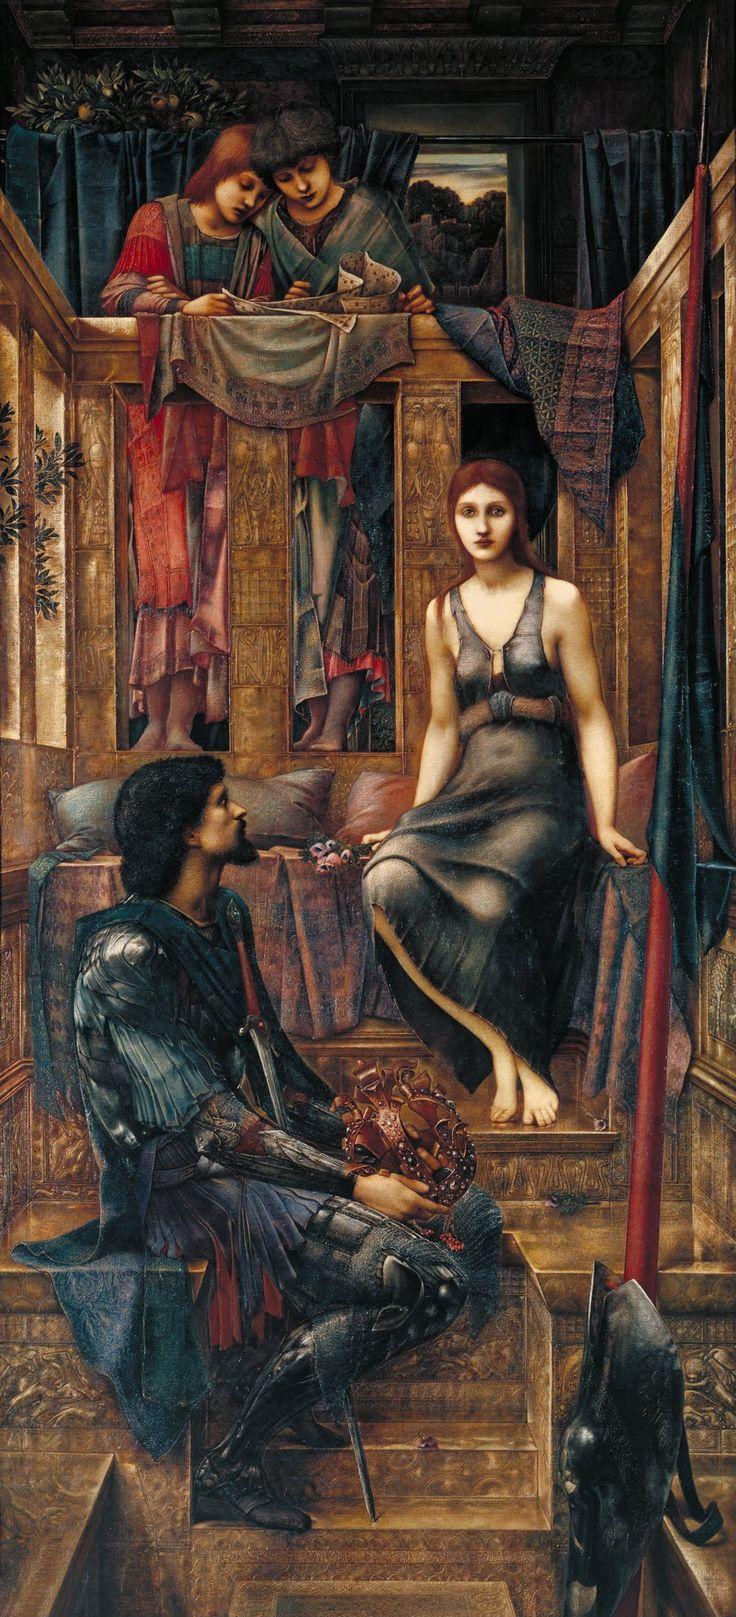 Edward_Burne-Jones_-_King_Cophetua_and_the_Beggar_Maid_-_Google_Art_Project.jpg (1054×2316)